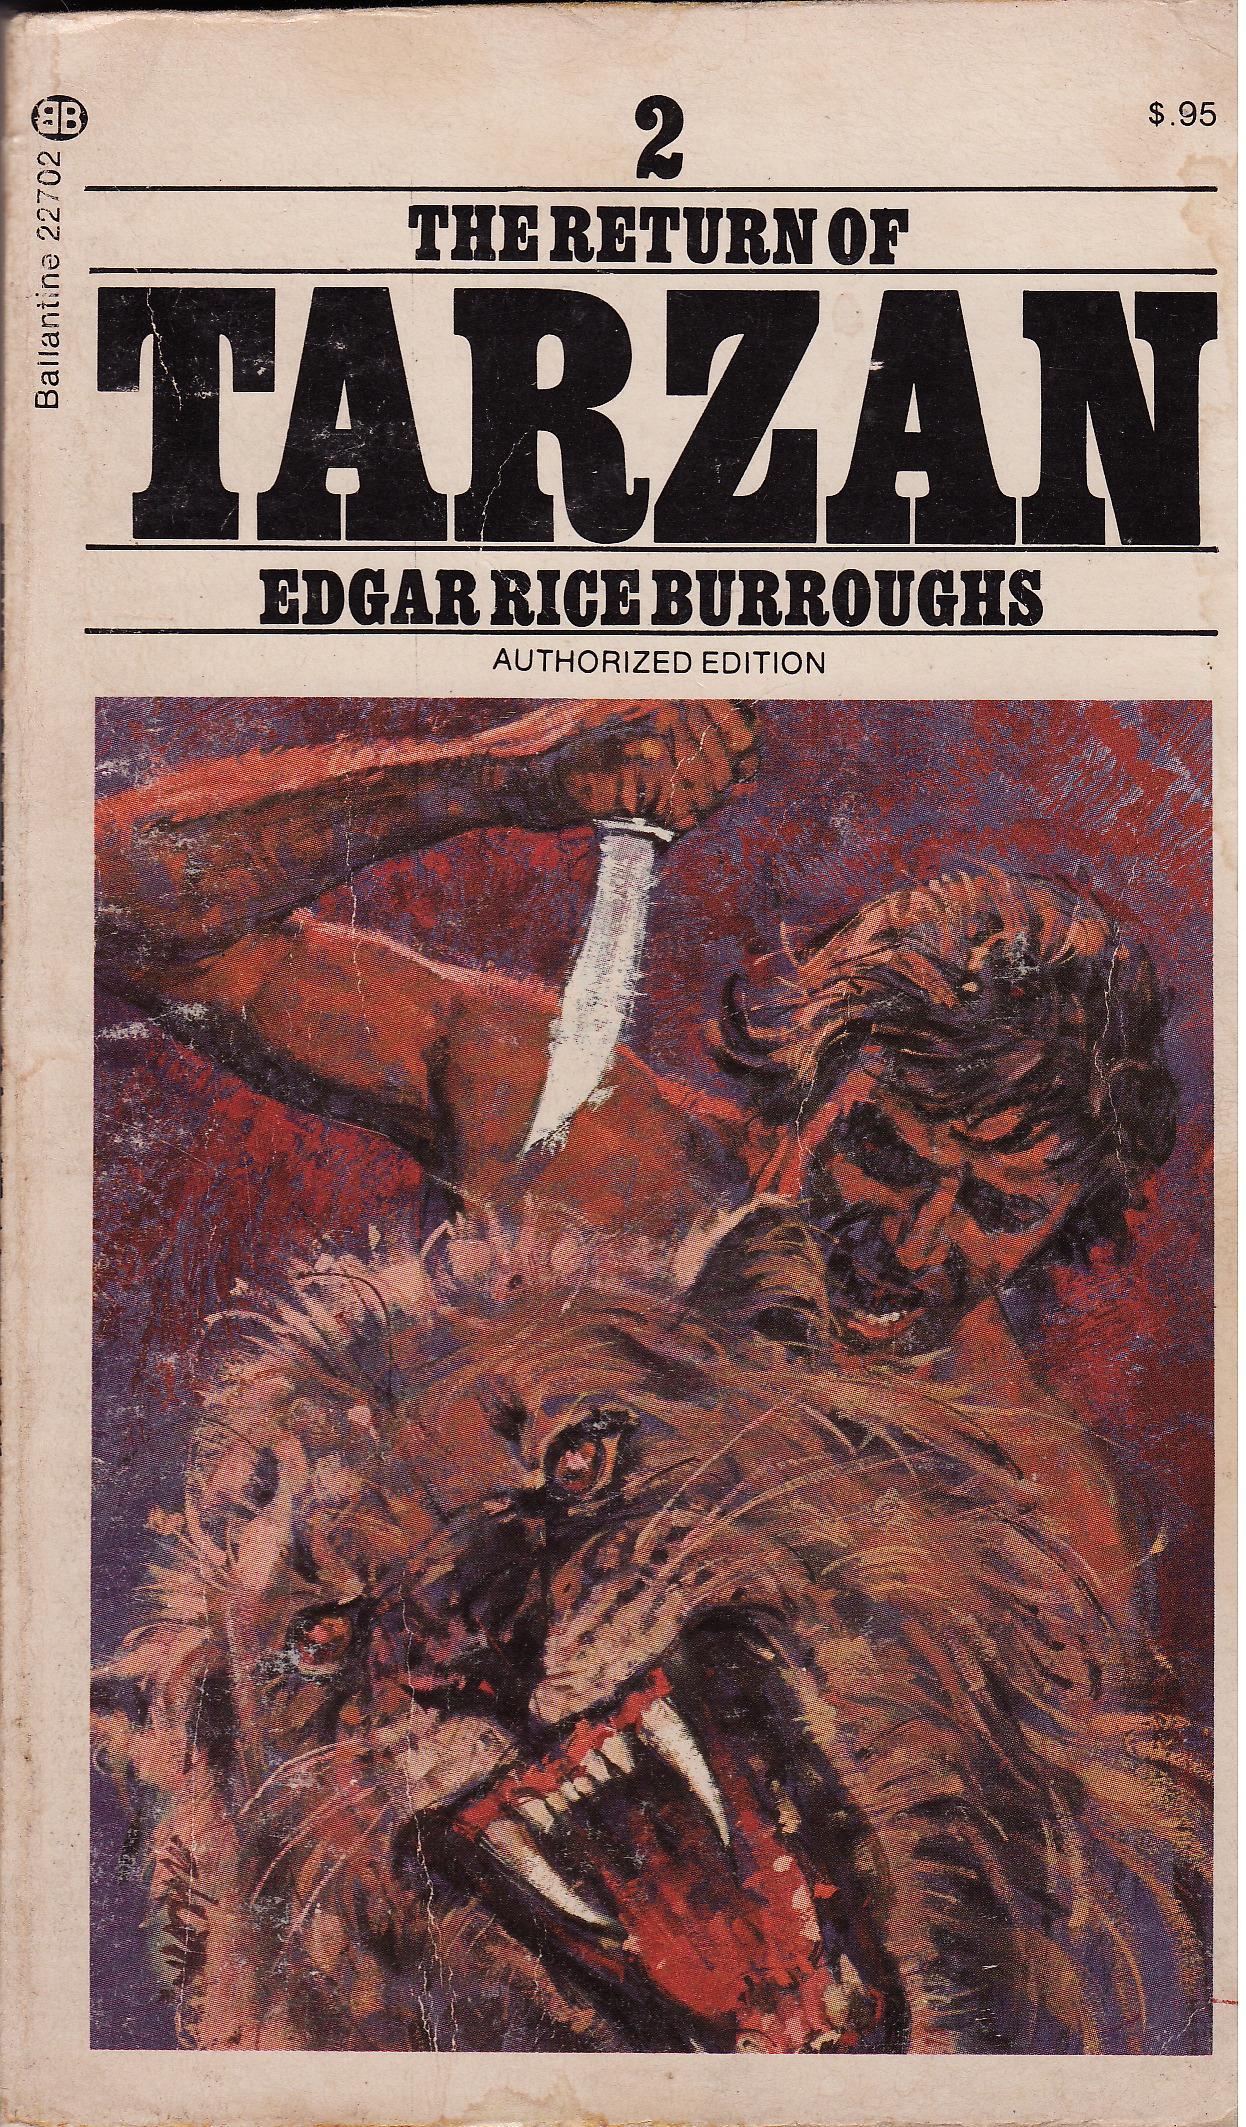 Book Review The Return of Tarzan by Edgar Rice Burroughs